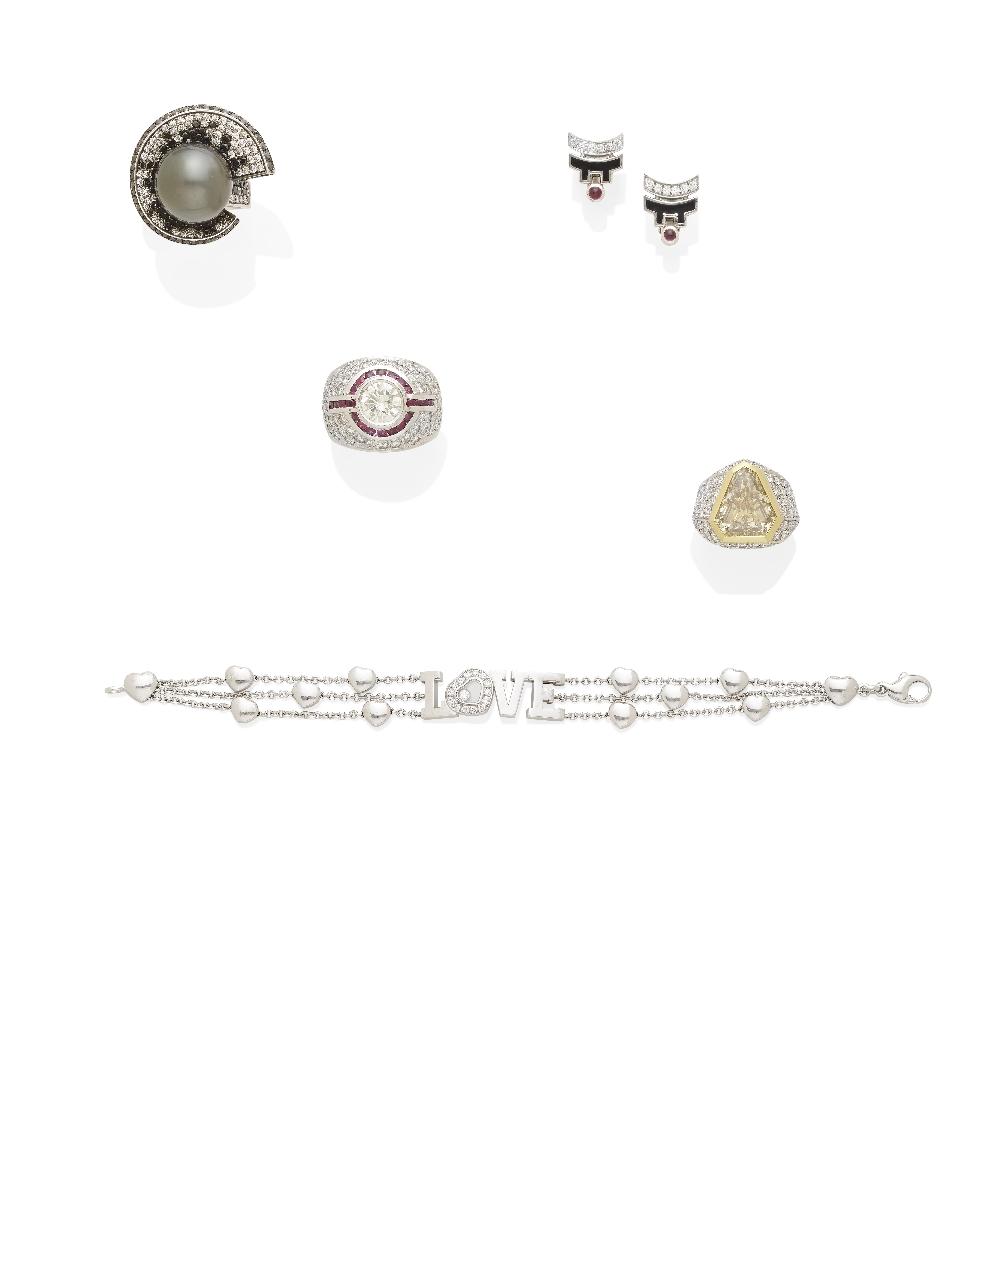 A 'Happy Diamond' bracelet, Chopard